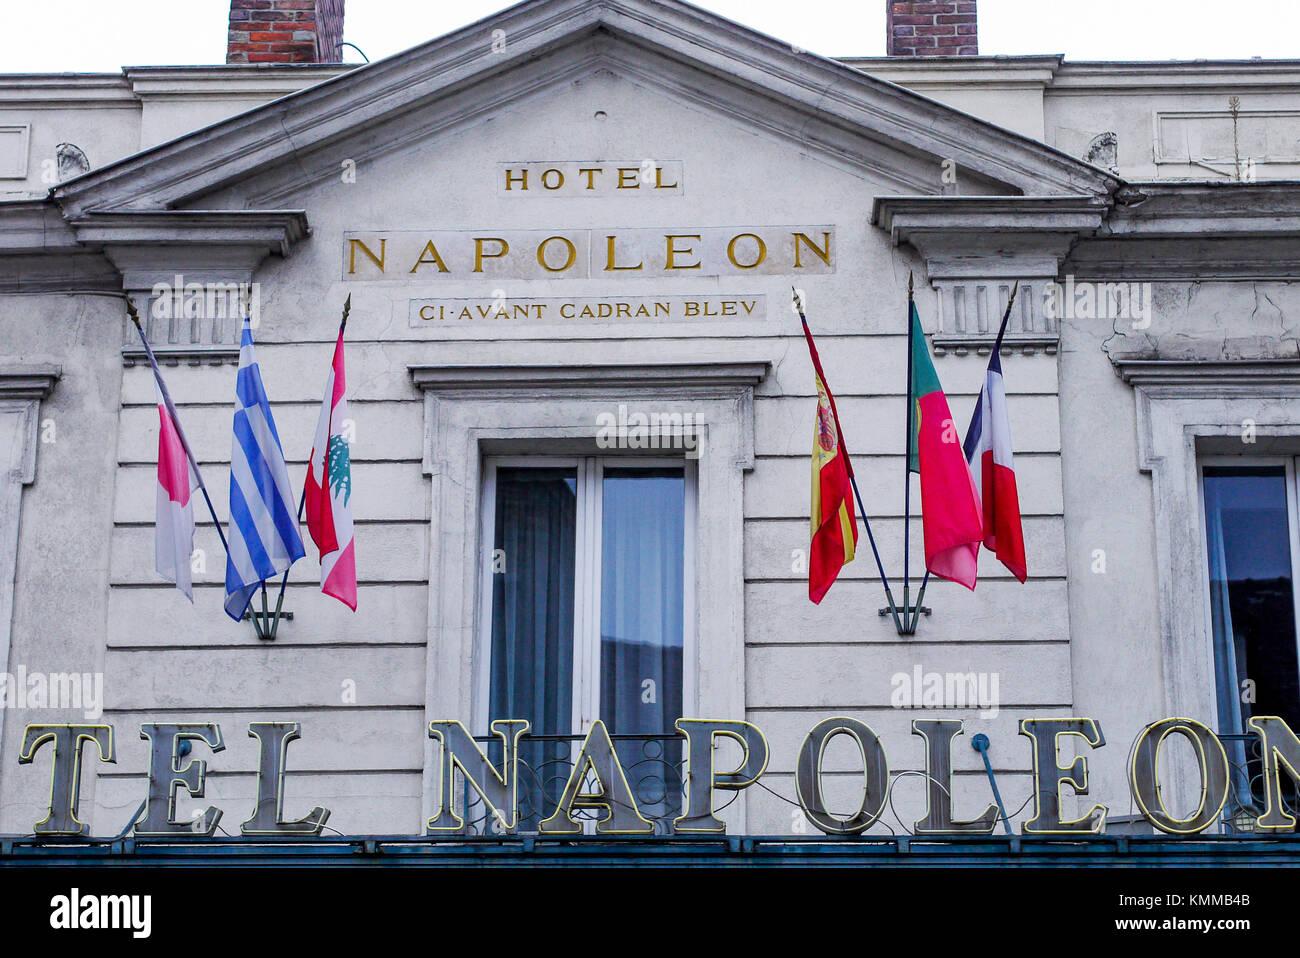 hotel napoleon stock photos hotel napoleon stock images. Black Bedroom Furniture Sets. Home Design Ideas